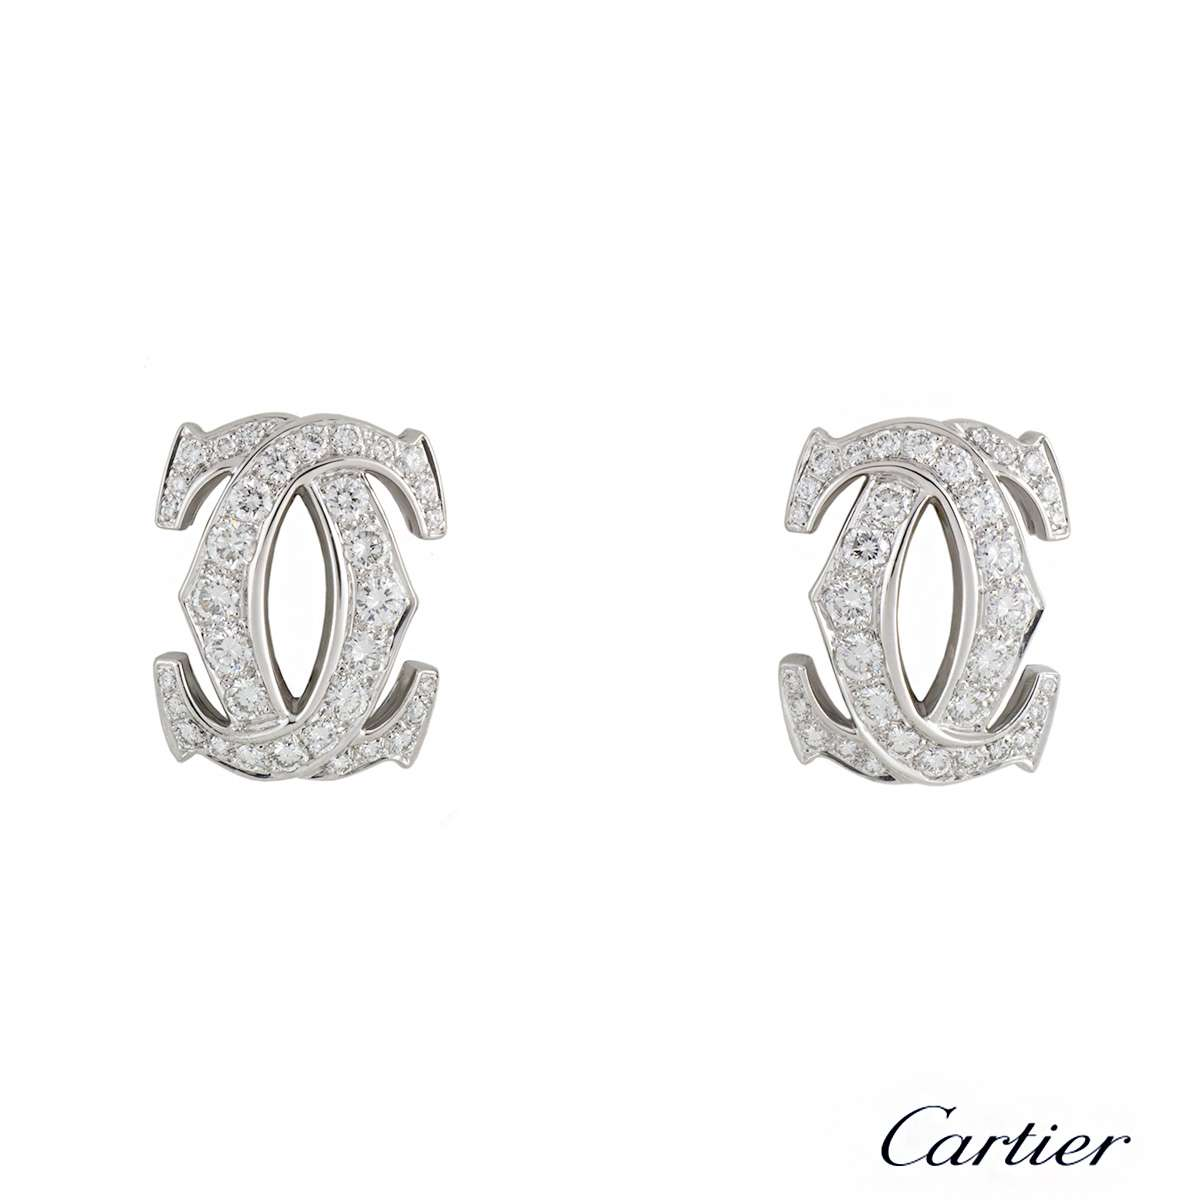 CartierC de Cartier Diamond White GoldEarrings